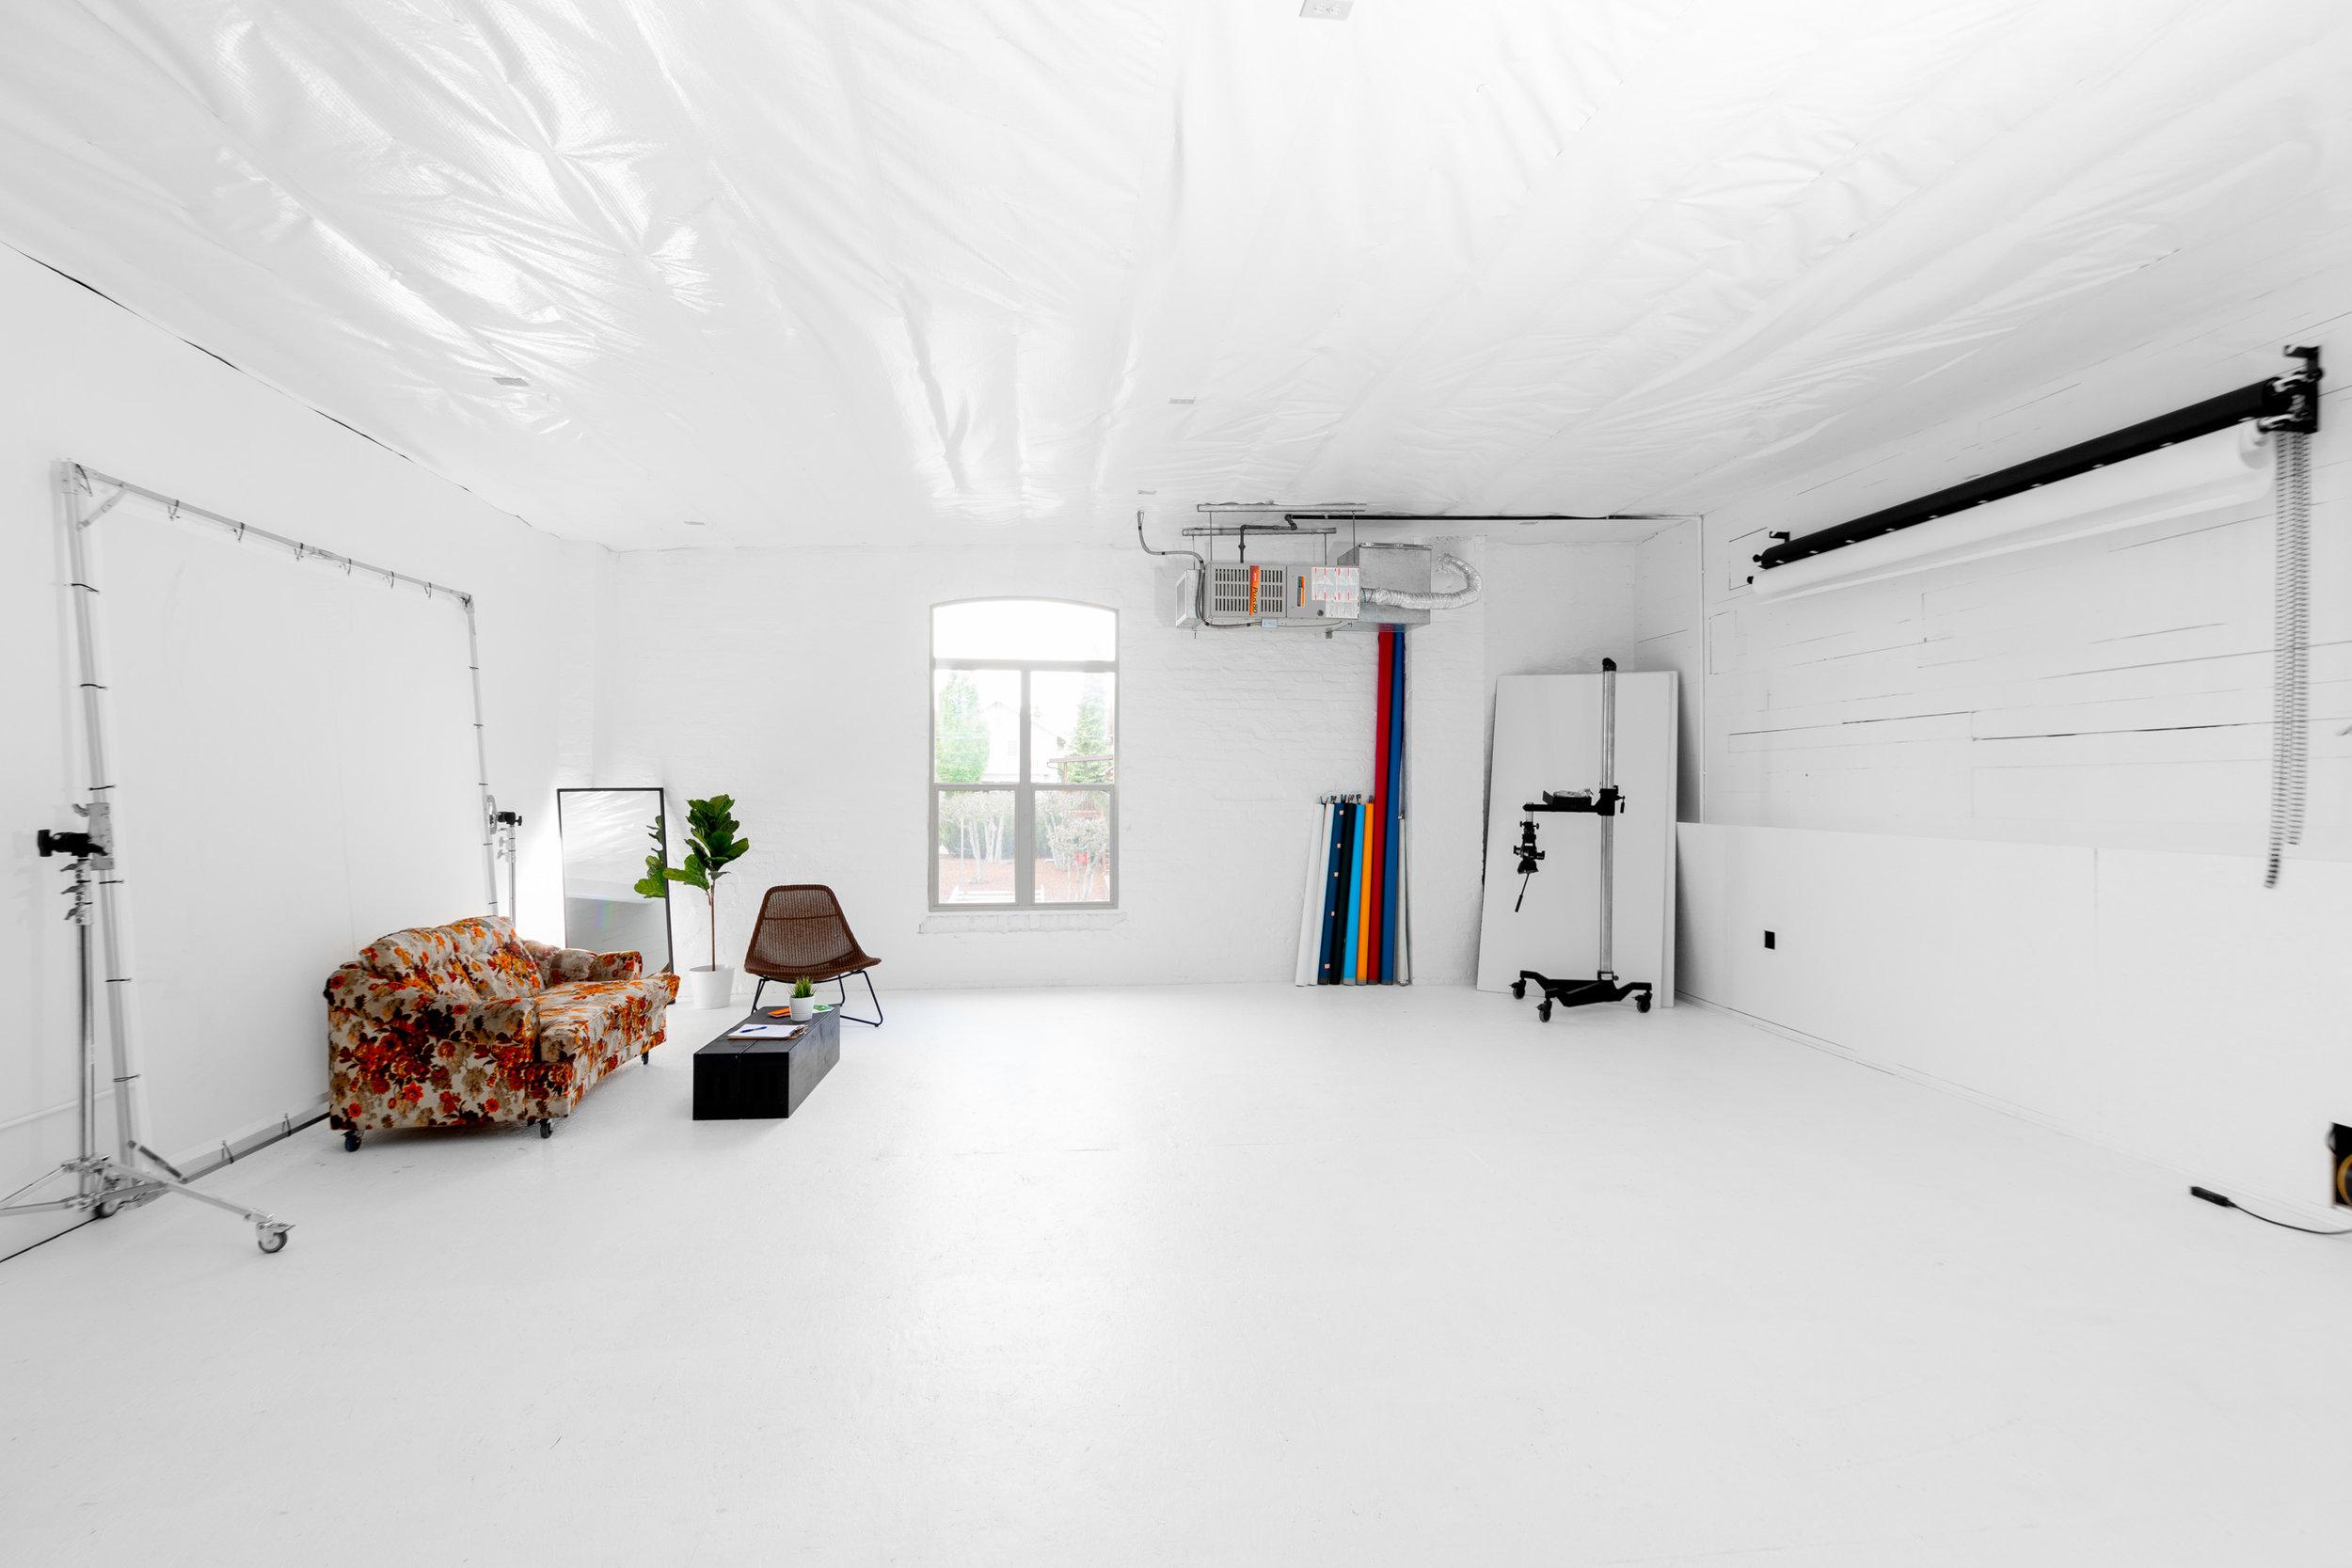 spencer wallace photo studio rental video-1.jpg